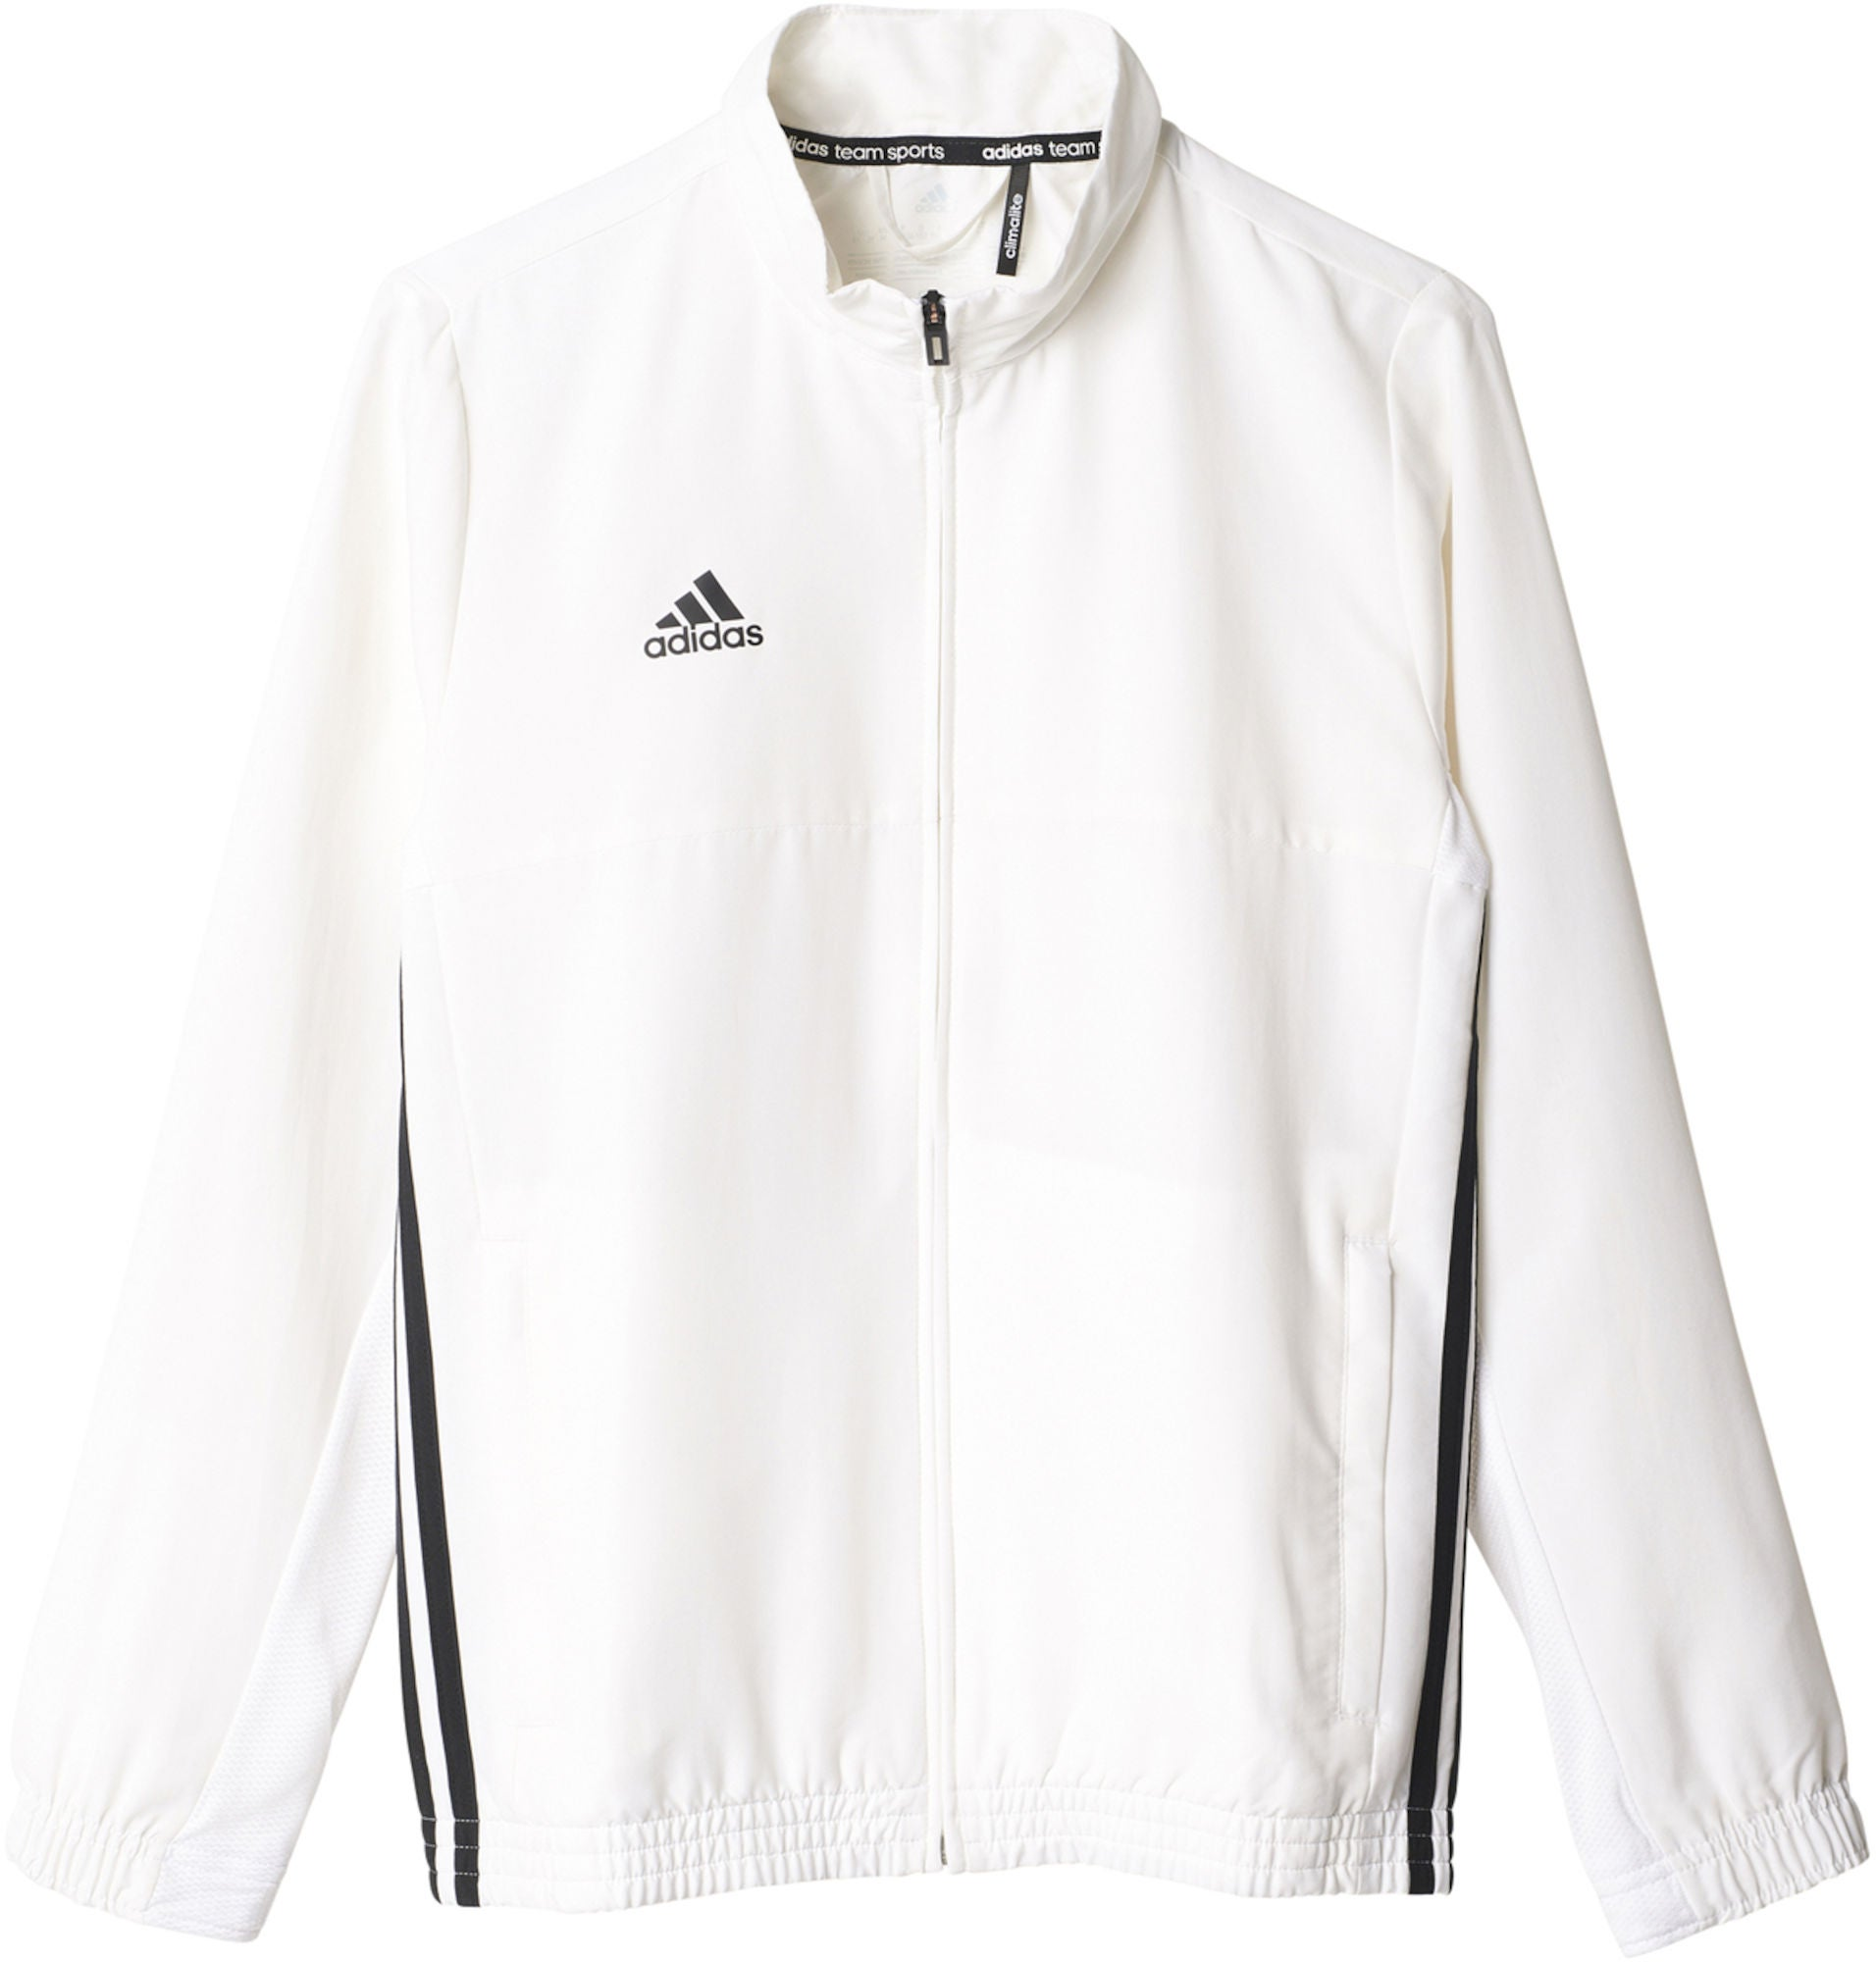 Osta Adidas T16 Team Jacket Y Treenitakki, White   Jollyroom